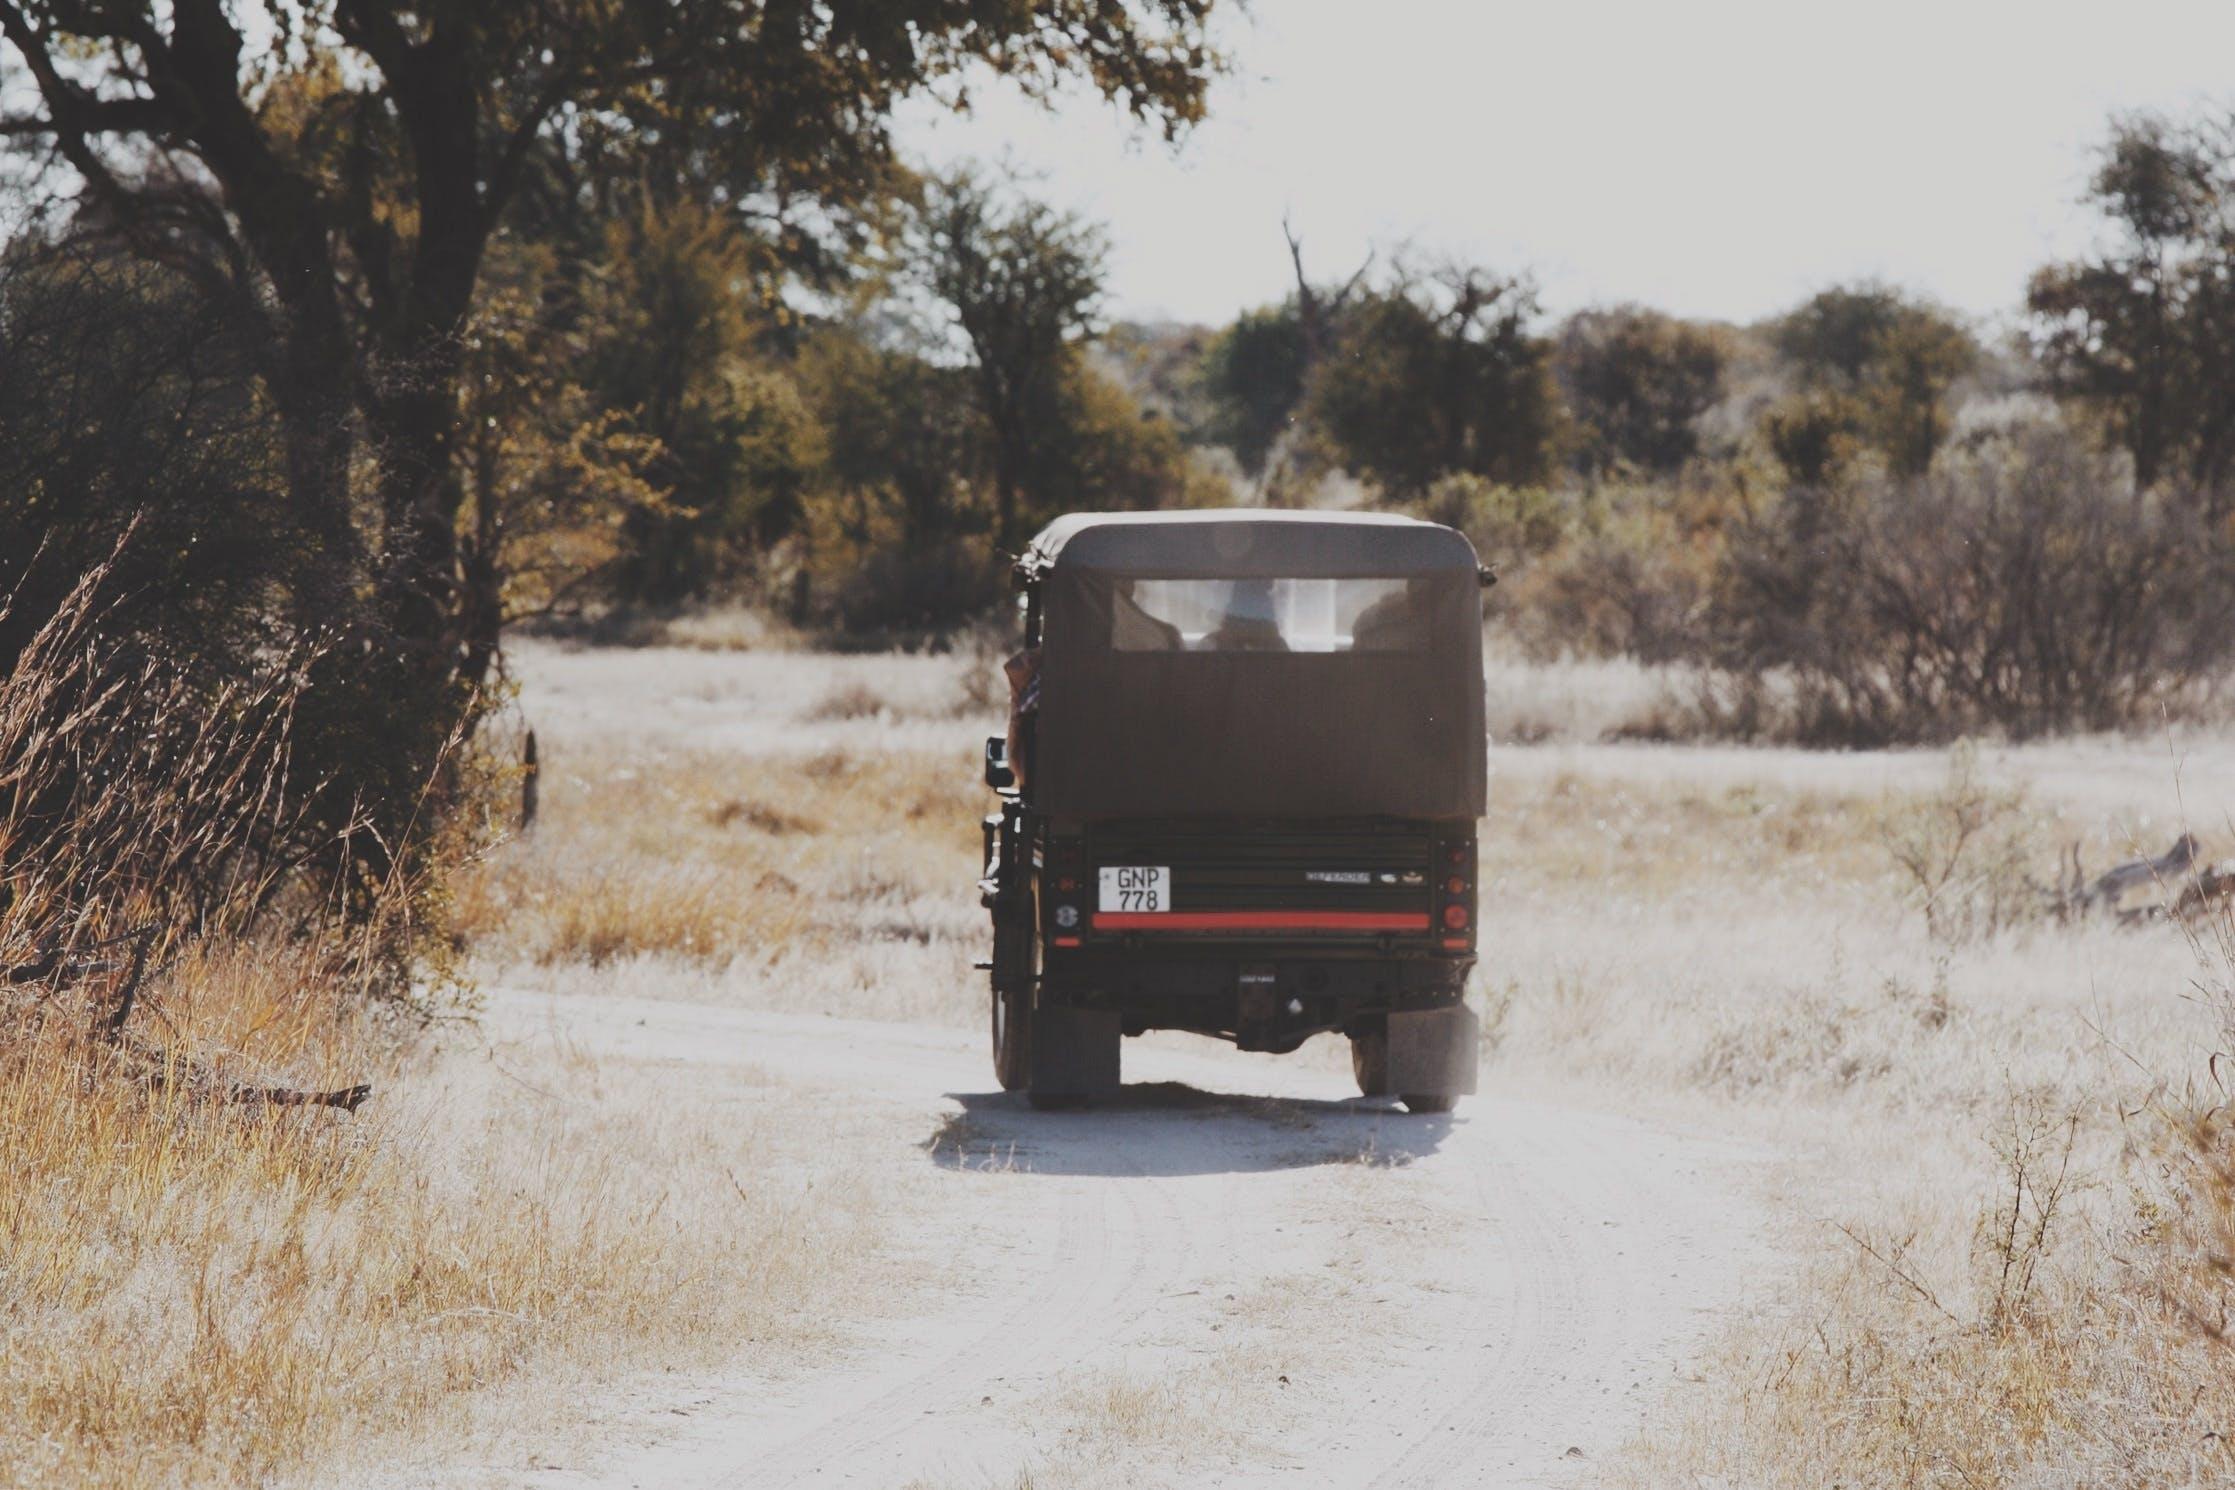 Black Suv on Dirt Road